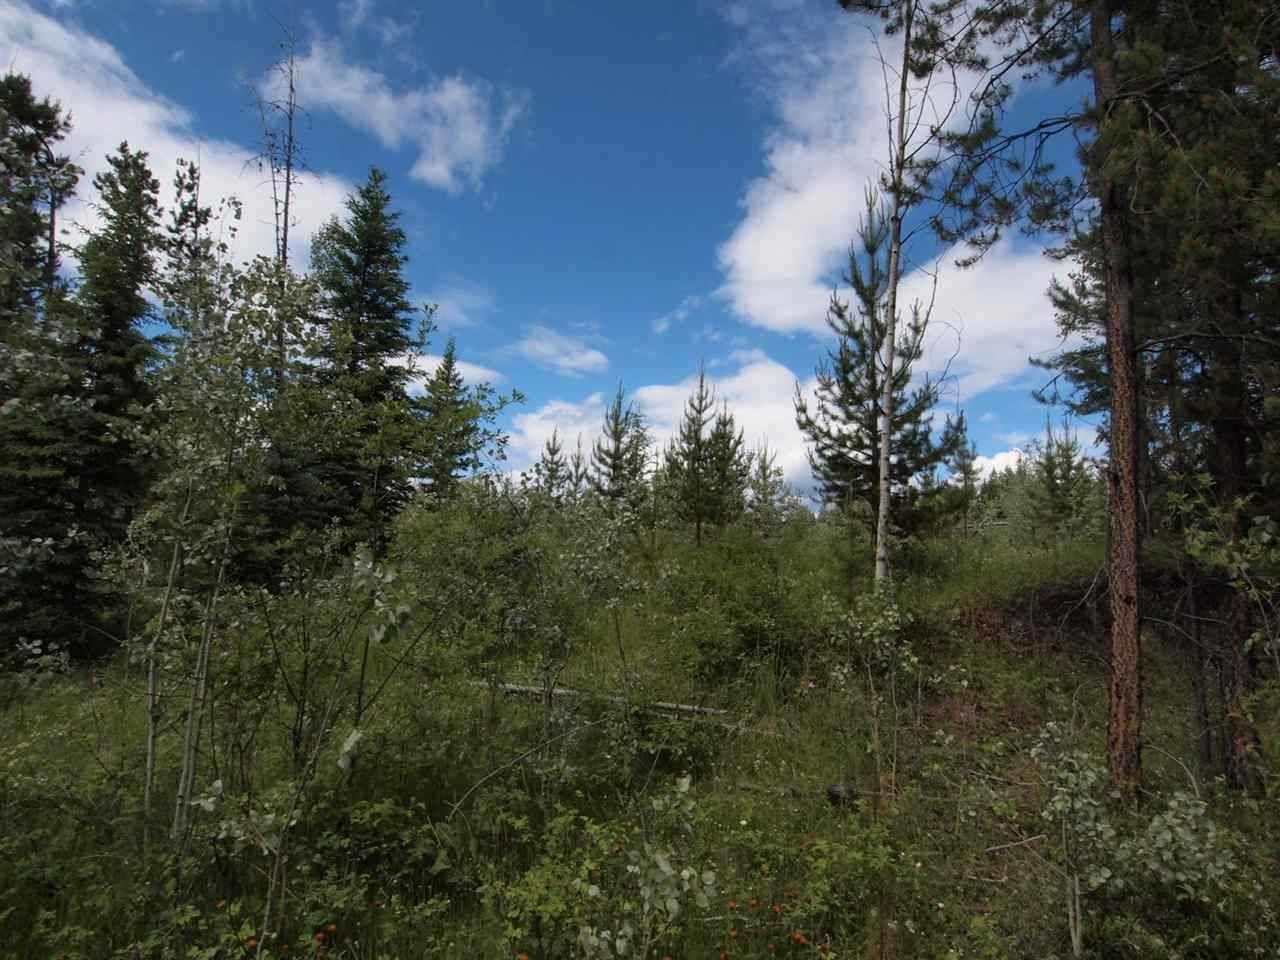 Photo 4: Photos: 4573 BAKKEN Road: Forest Grove Land for sale (100 Mile House (Zone 10))  : MLS®# R2377308